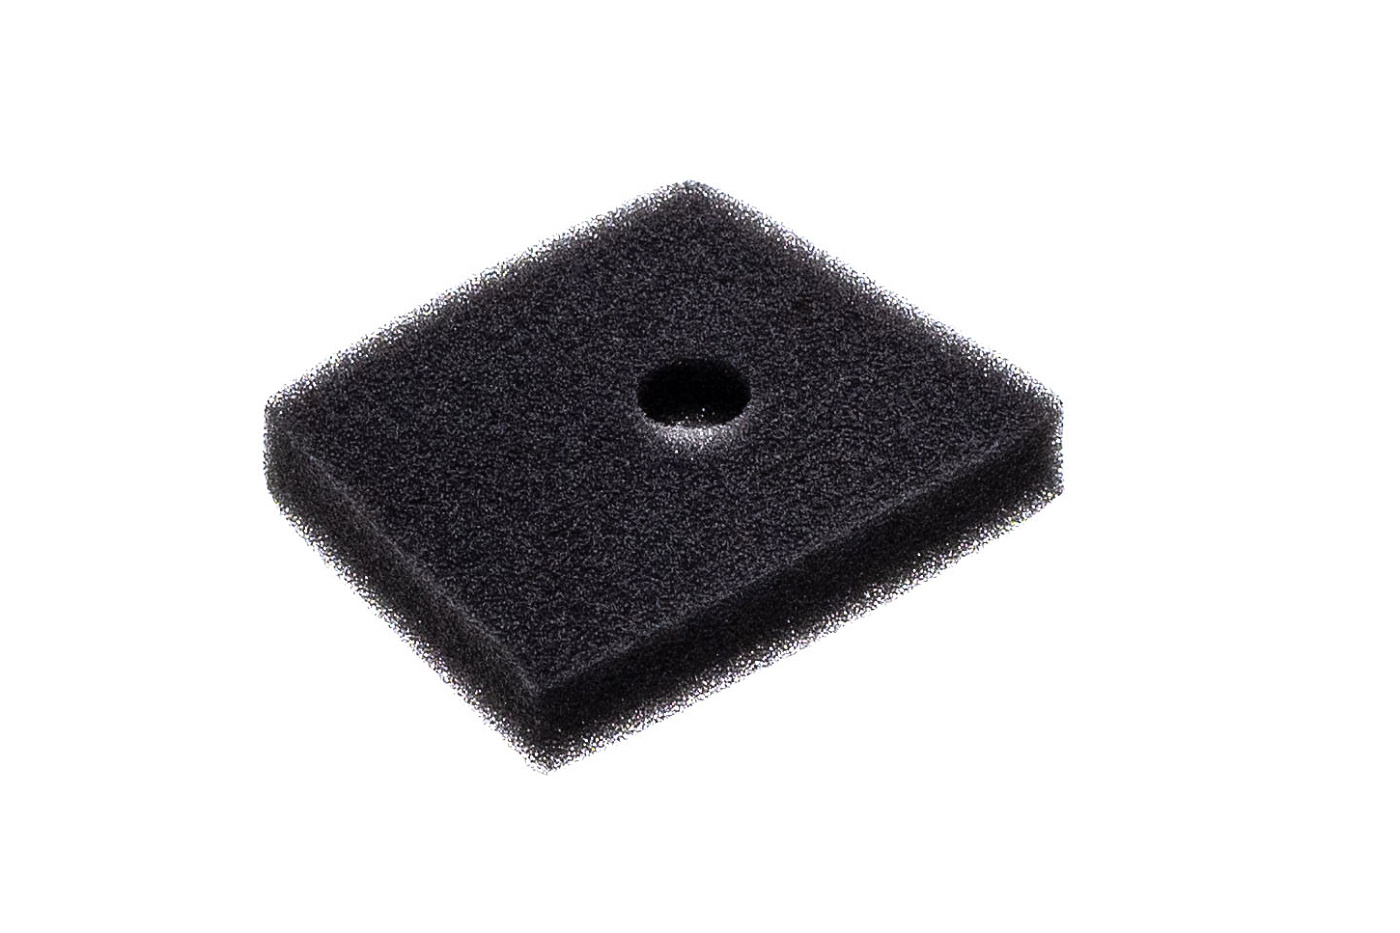 Vzduchový filtr Husqvarna  - 537 18 63-01